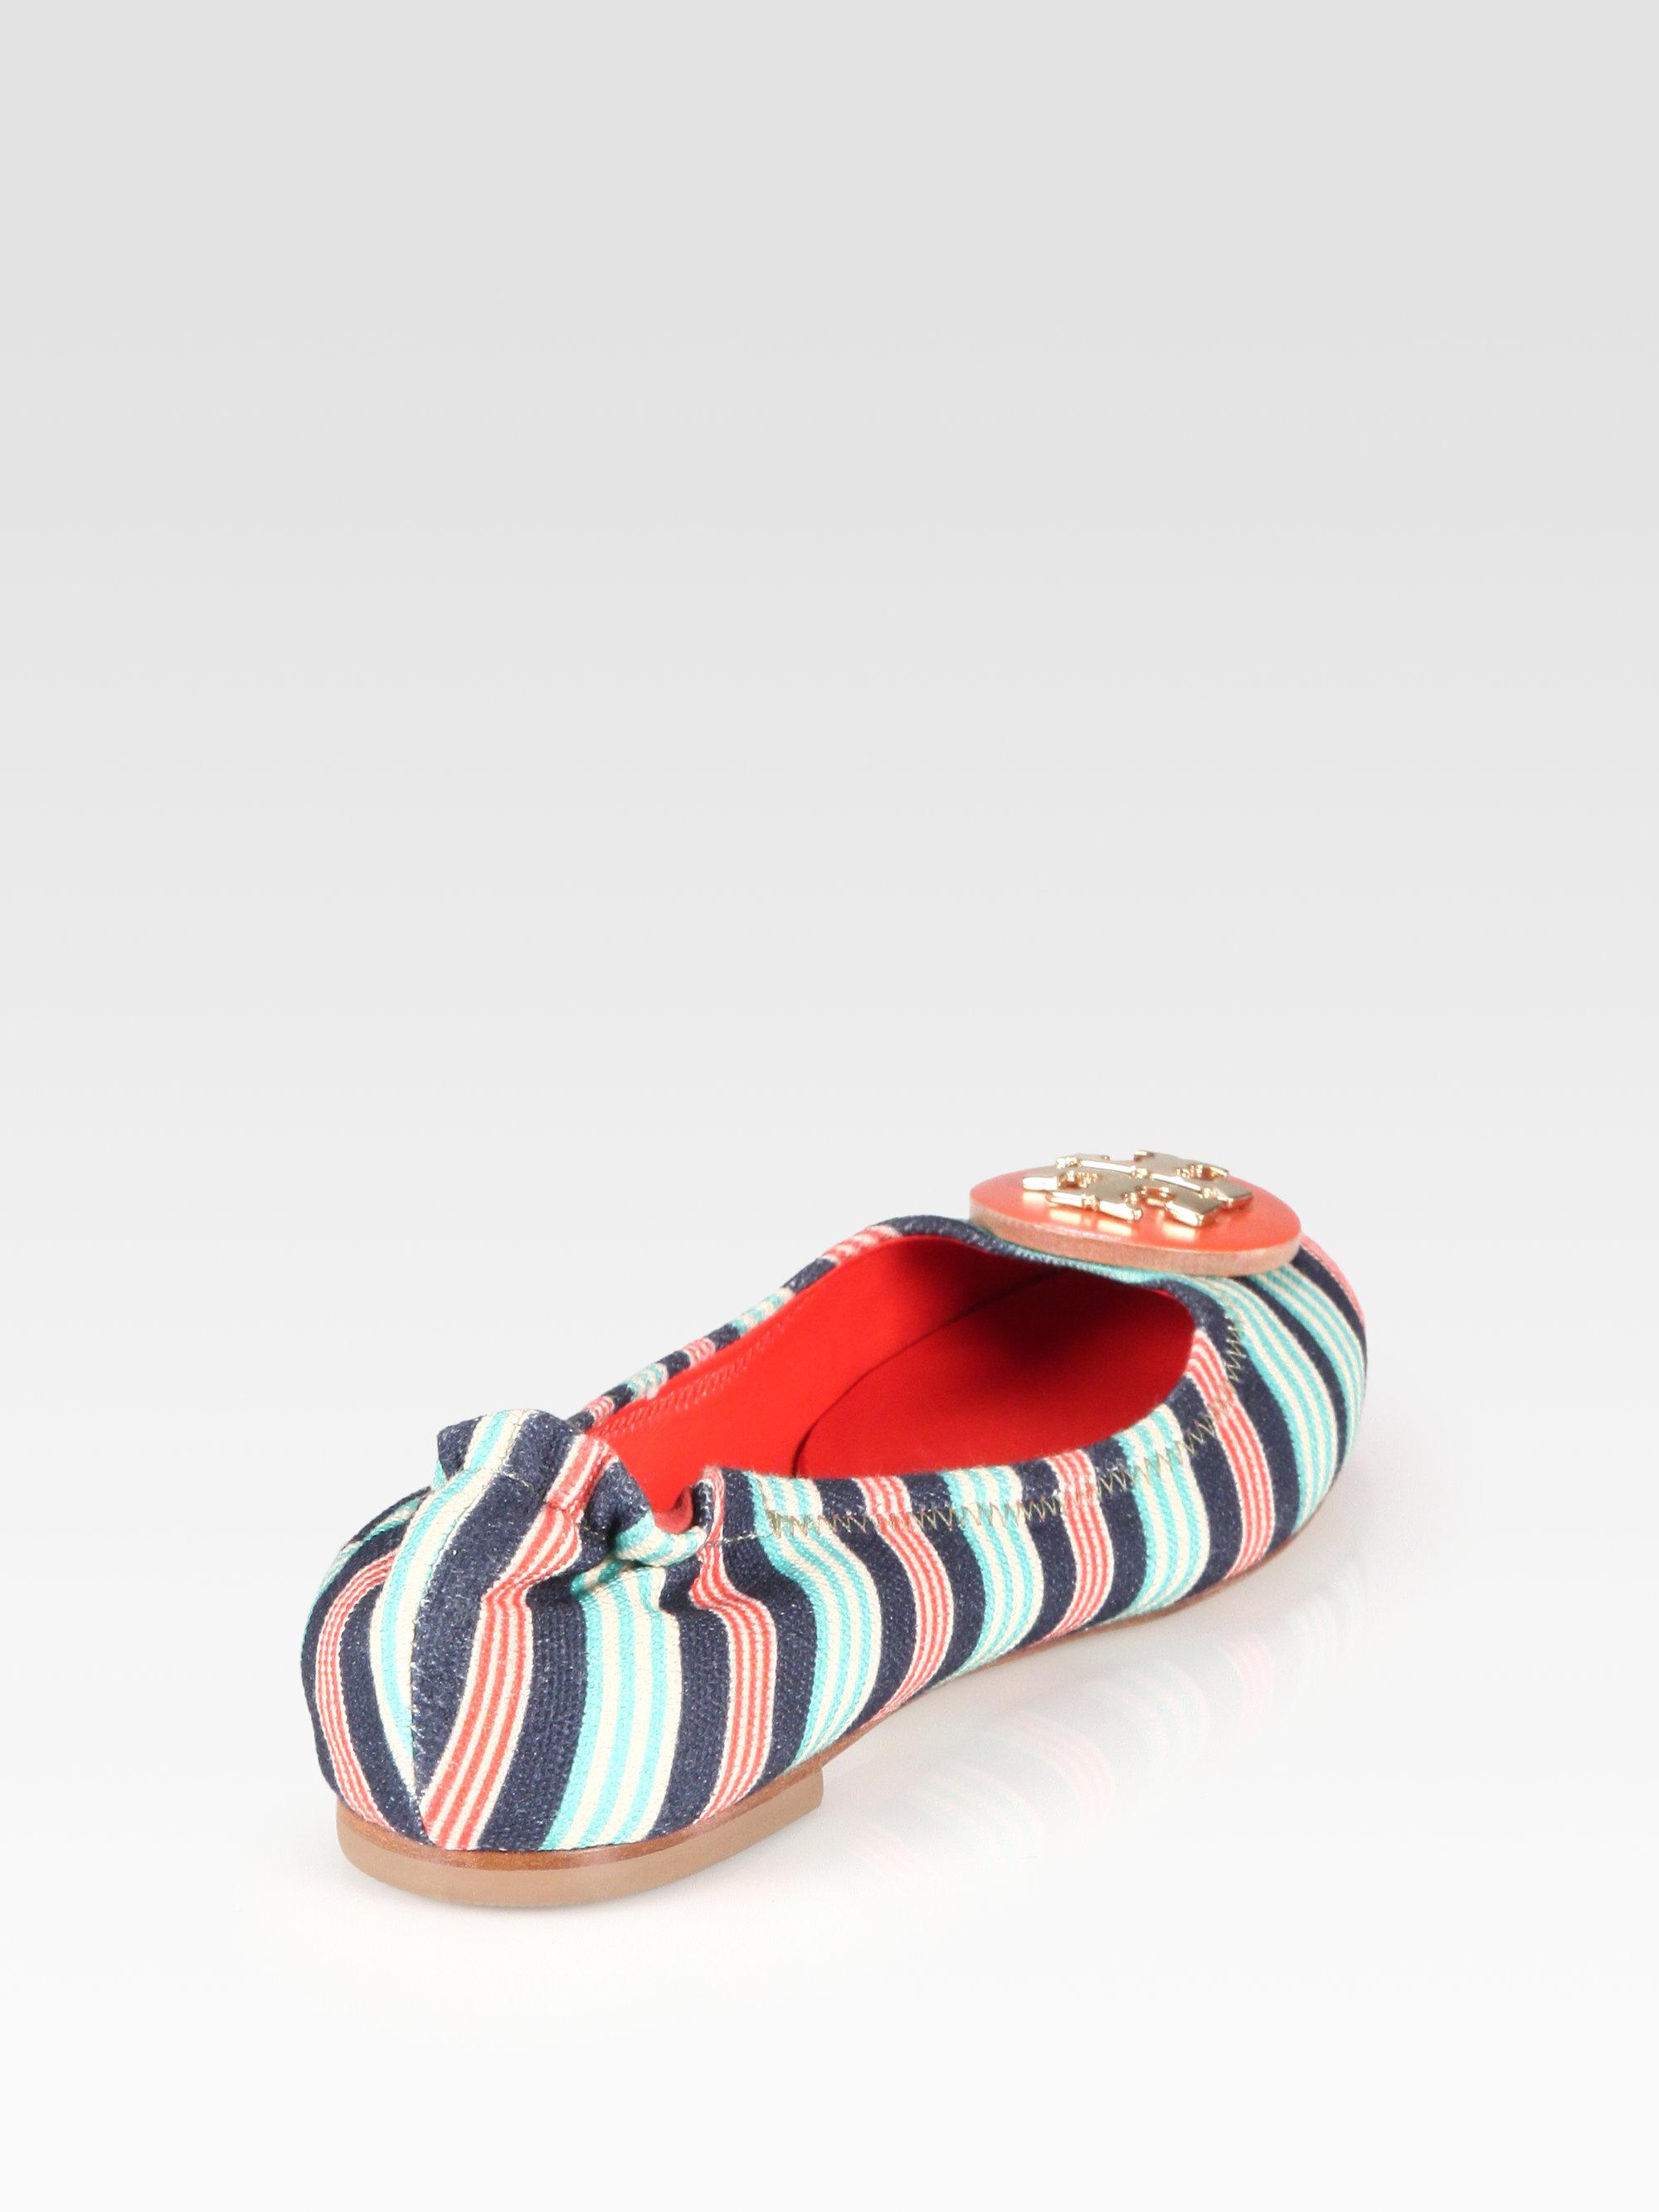 ba9064c47fe ... where can i buy lyst tory burch reva striped canvas logo ballet flats  in blue 91e08